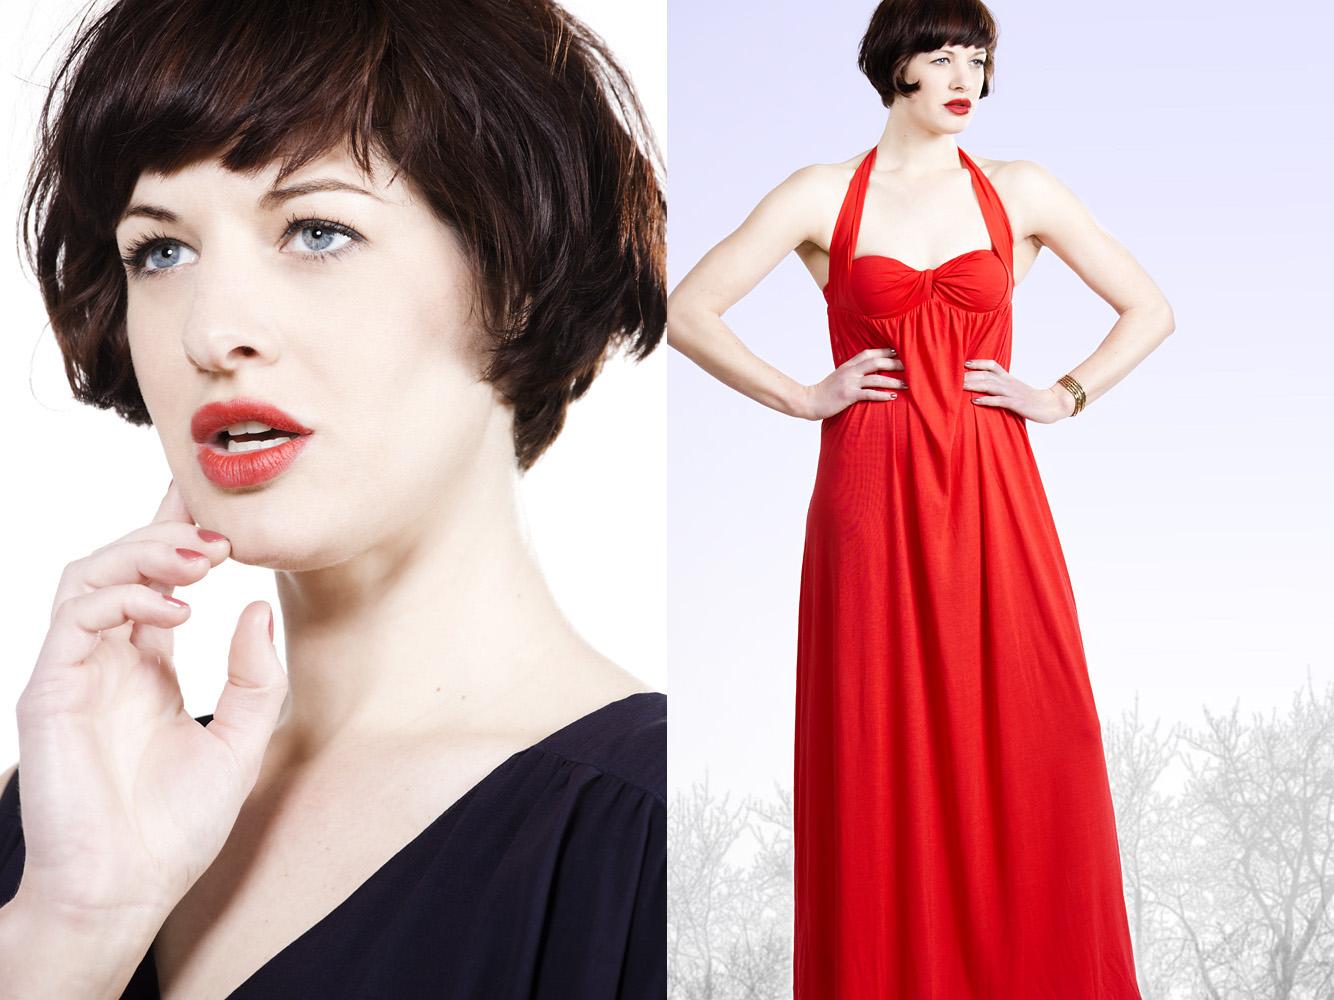 Photo by Margaret Yescombe, Advertising photographer london, studio photo-shoot, pale model, dark short hair, red lipstick, red dress